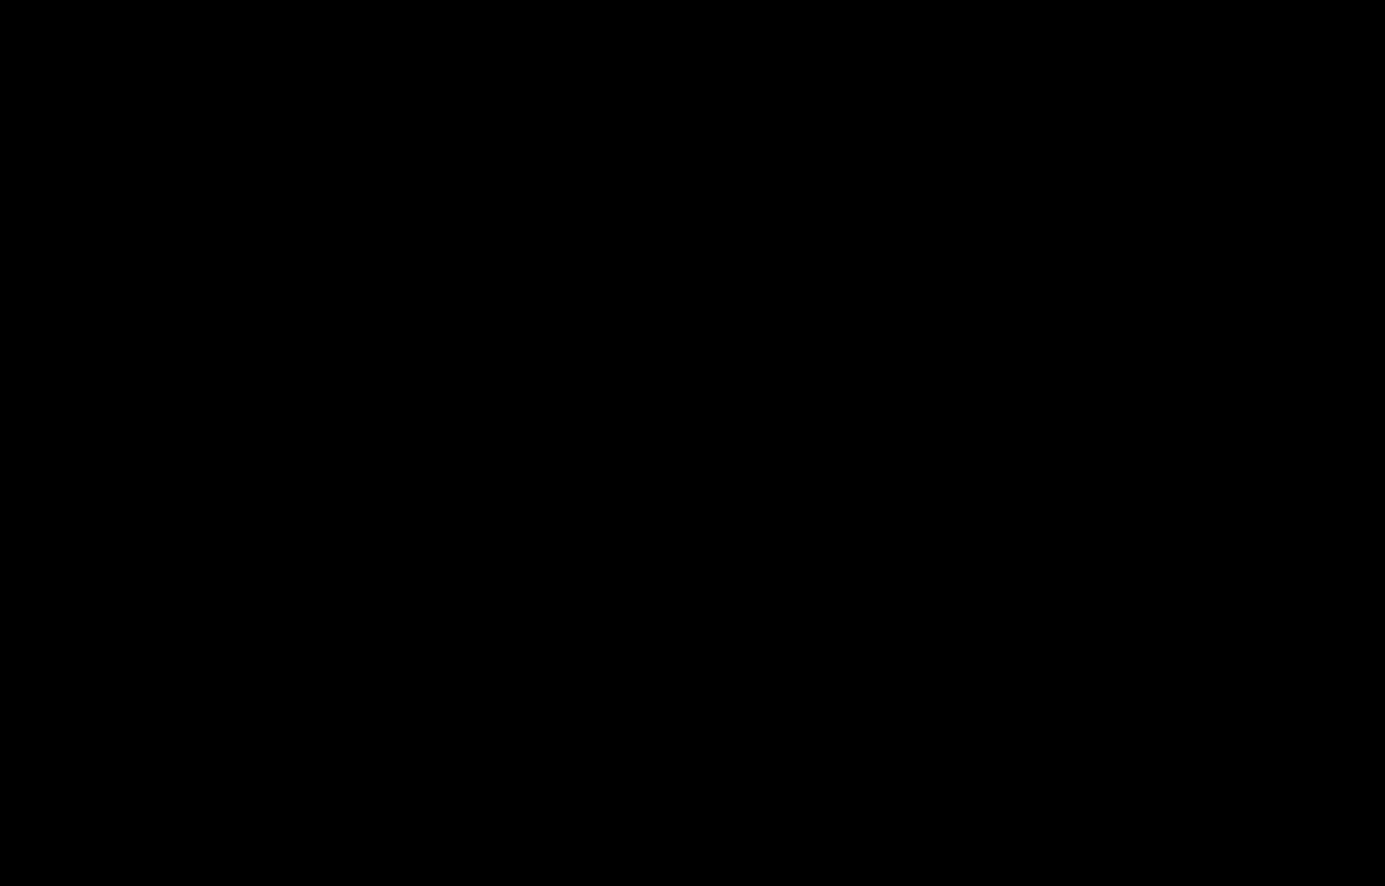 (3S)-tert-Butyldimethylsilyl Vitamin D2 SO<sub>2</sub> Adduct (Mixture of Diastereomers)